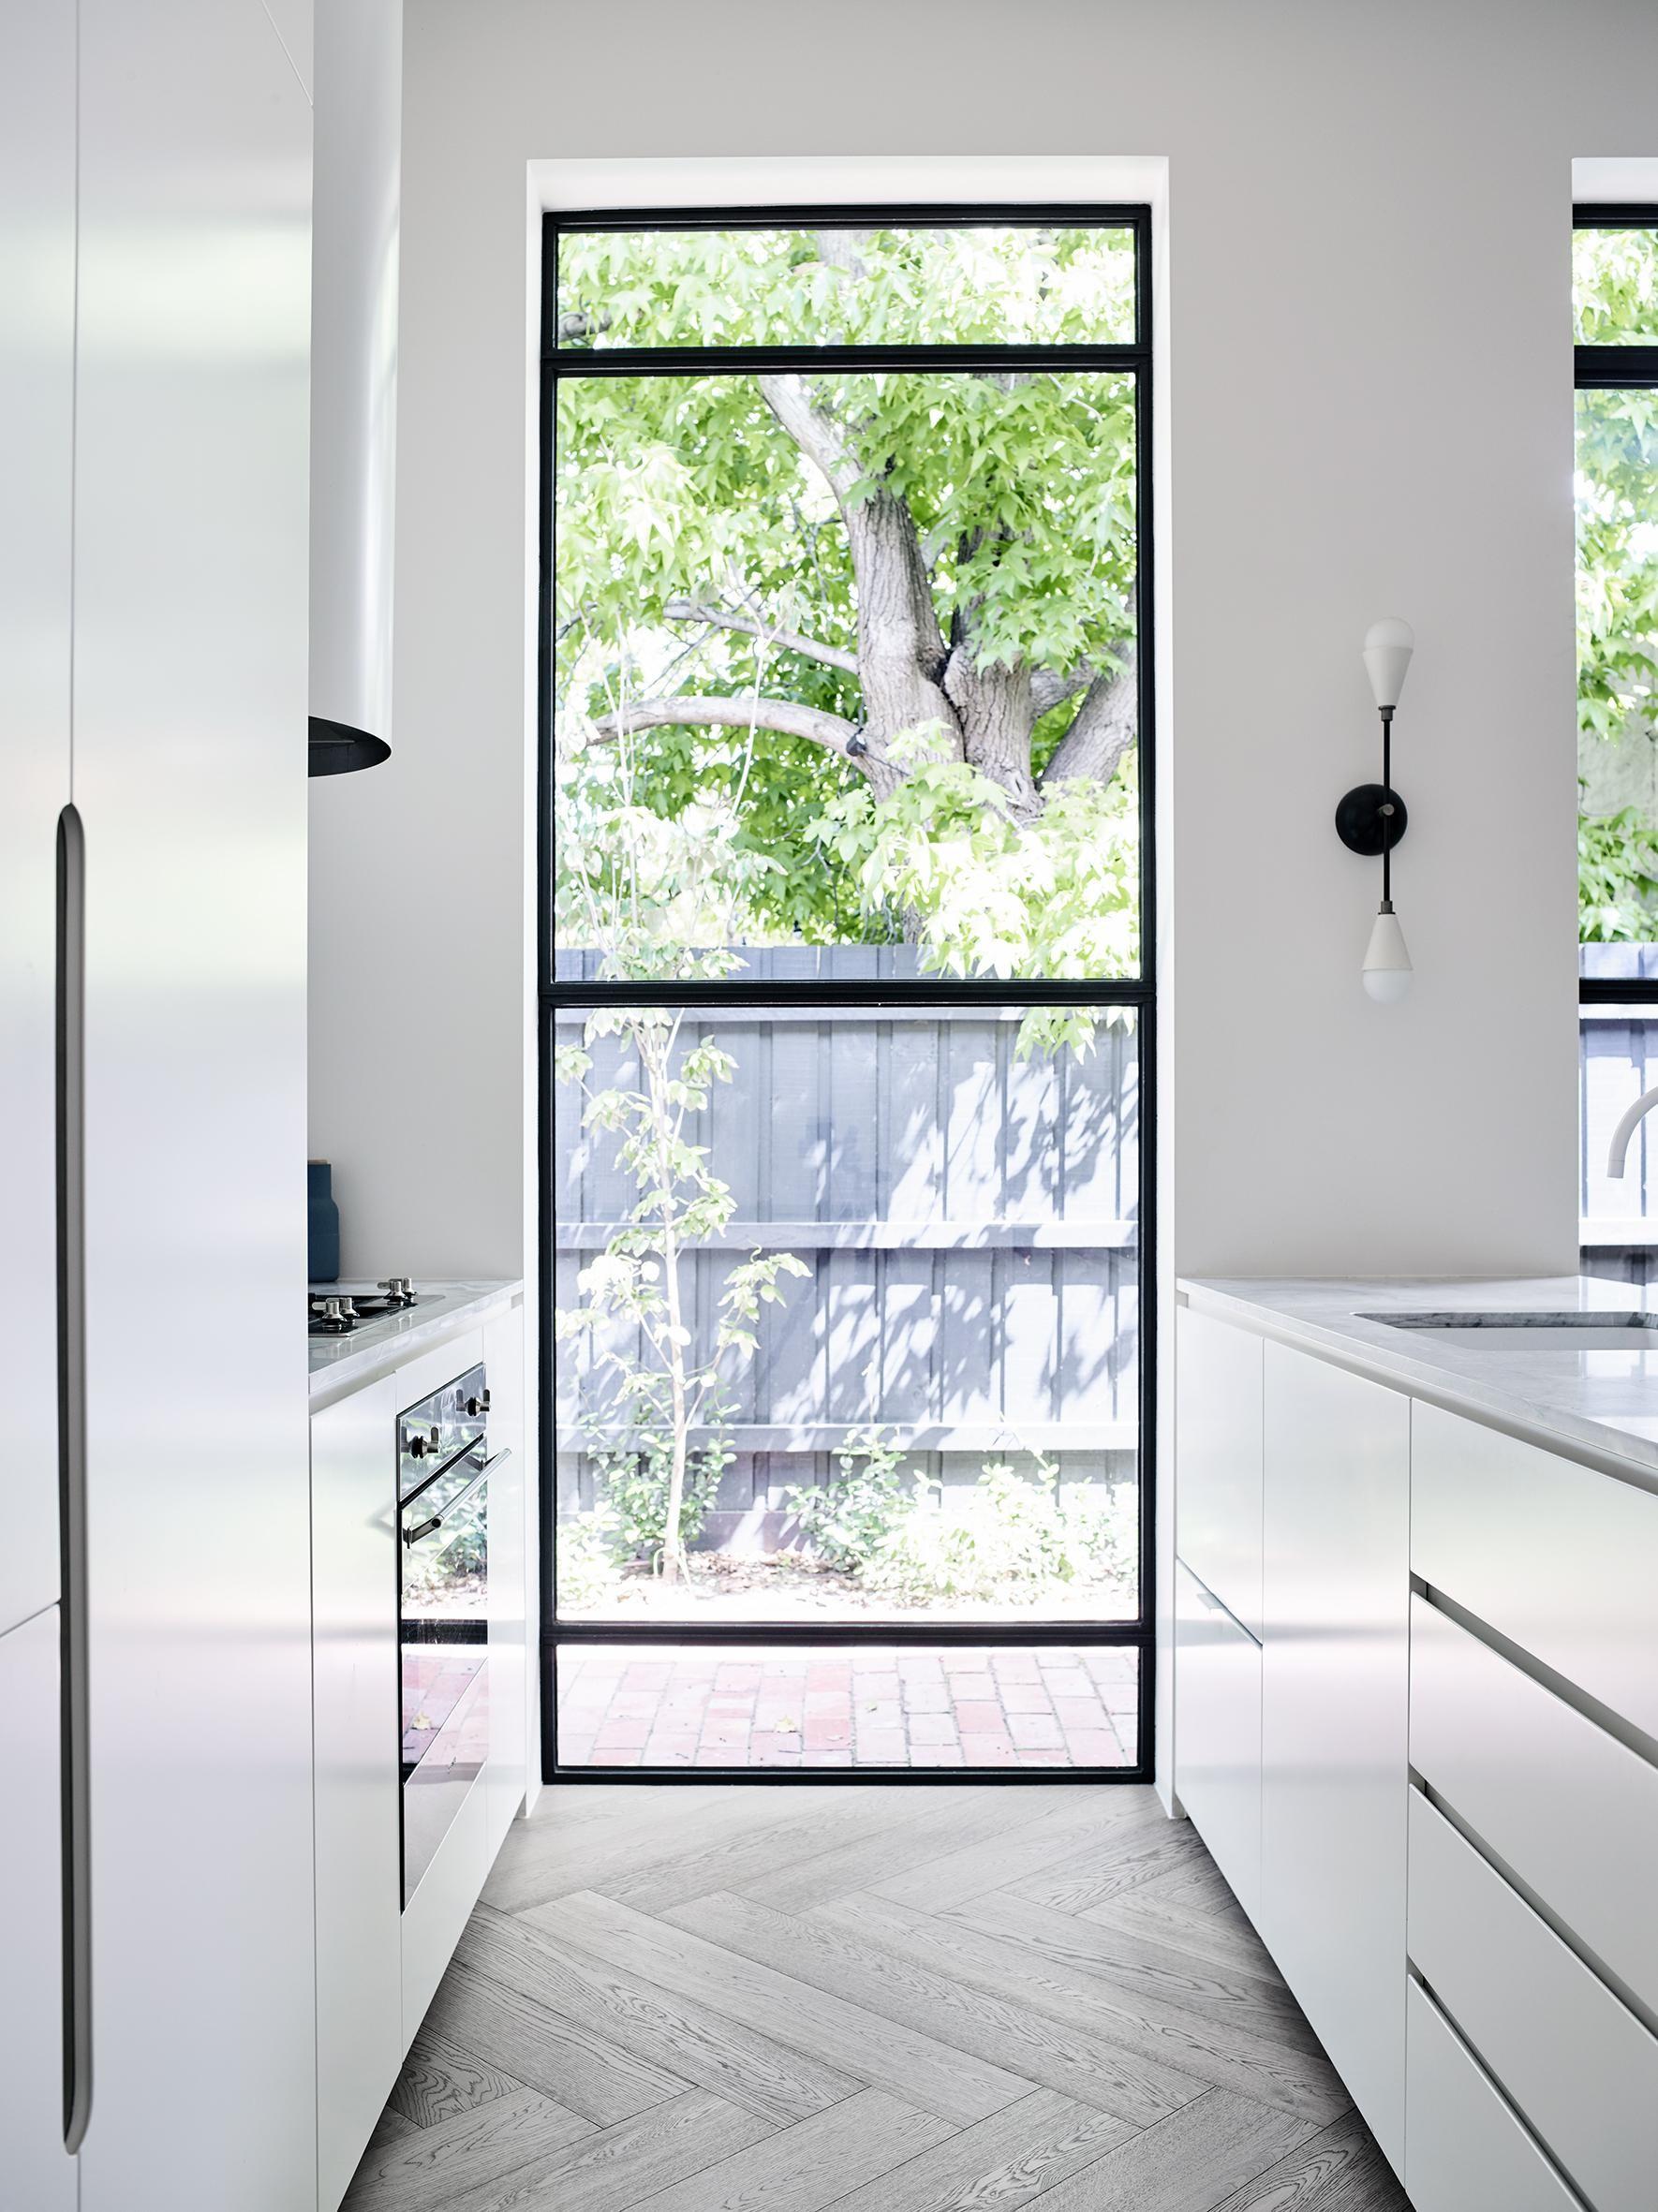 Prahran Residence by Luck Bock - Interior Design Australian Local Architecture - Elba New Volumes